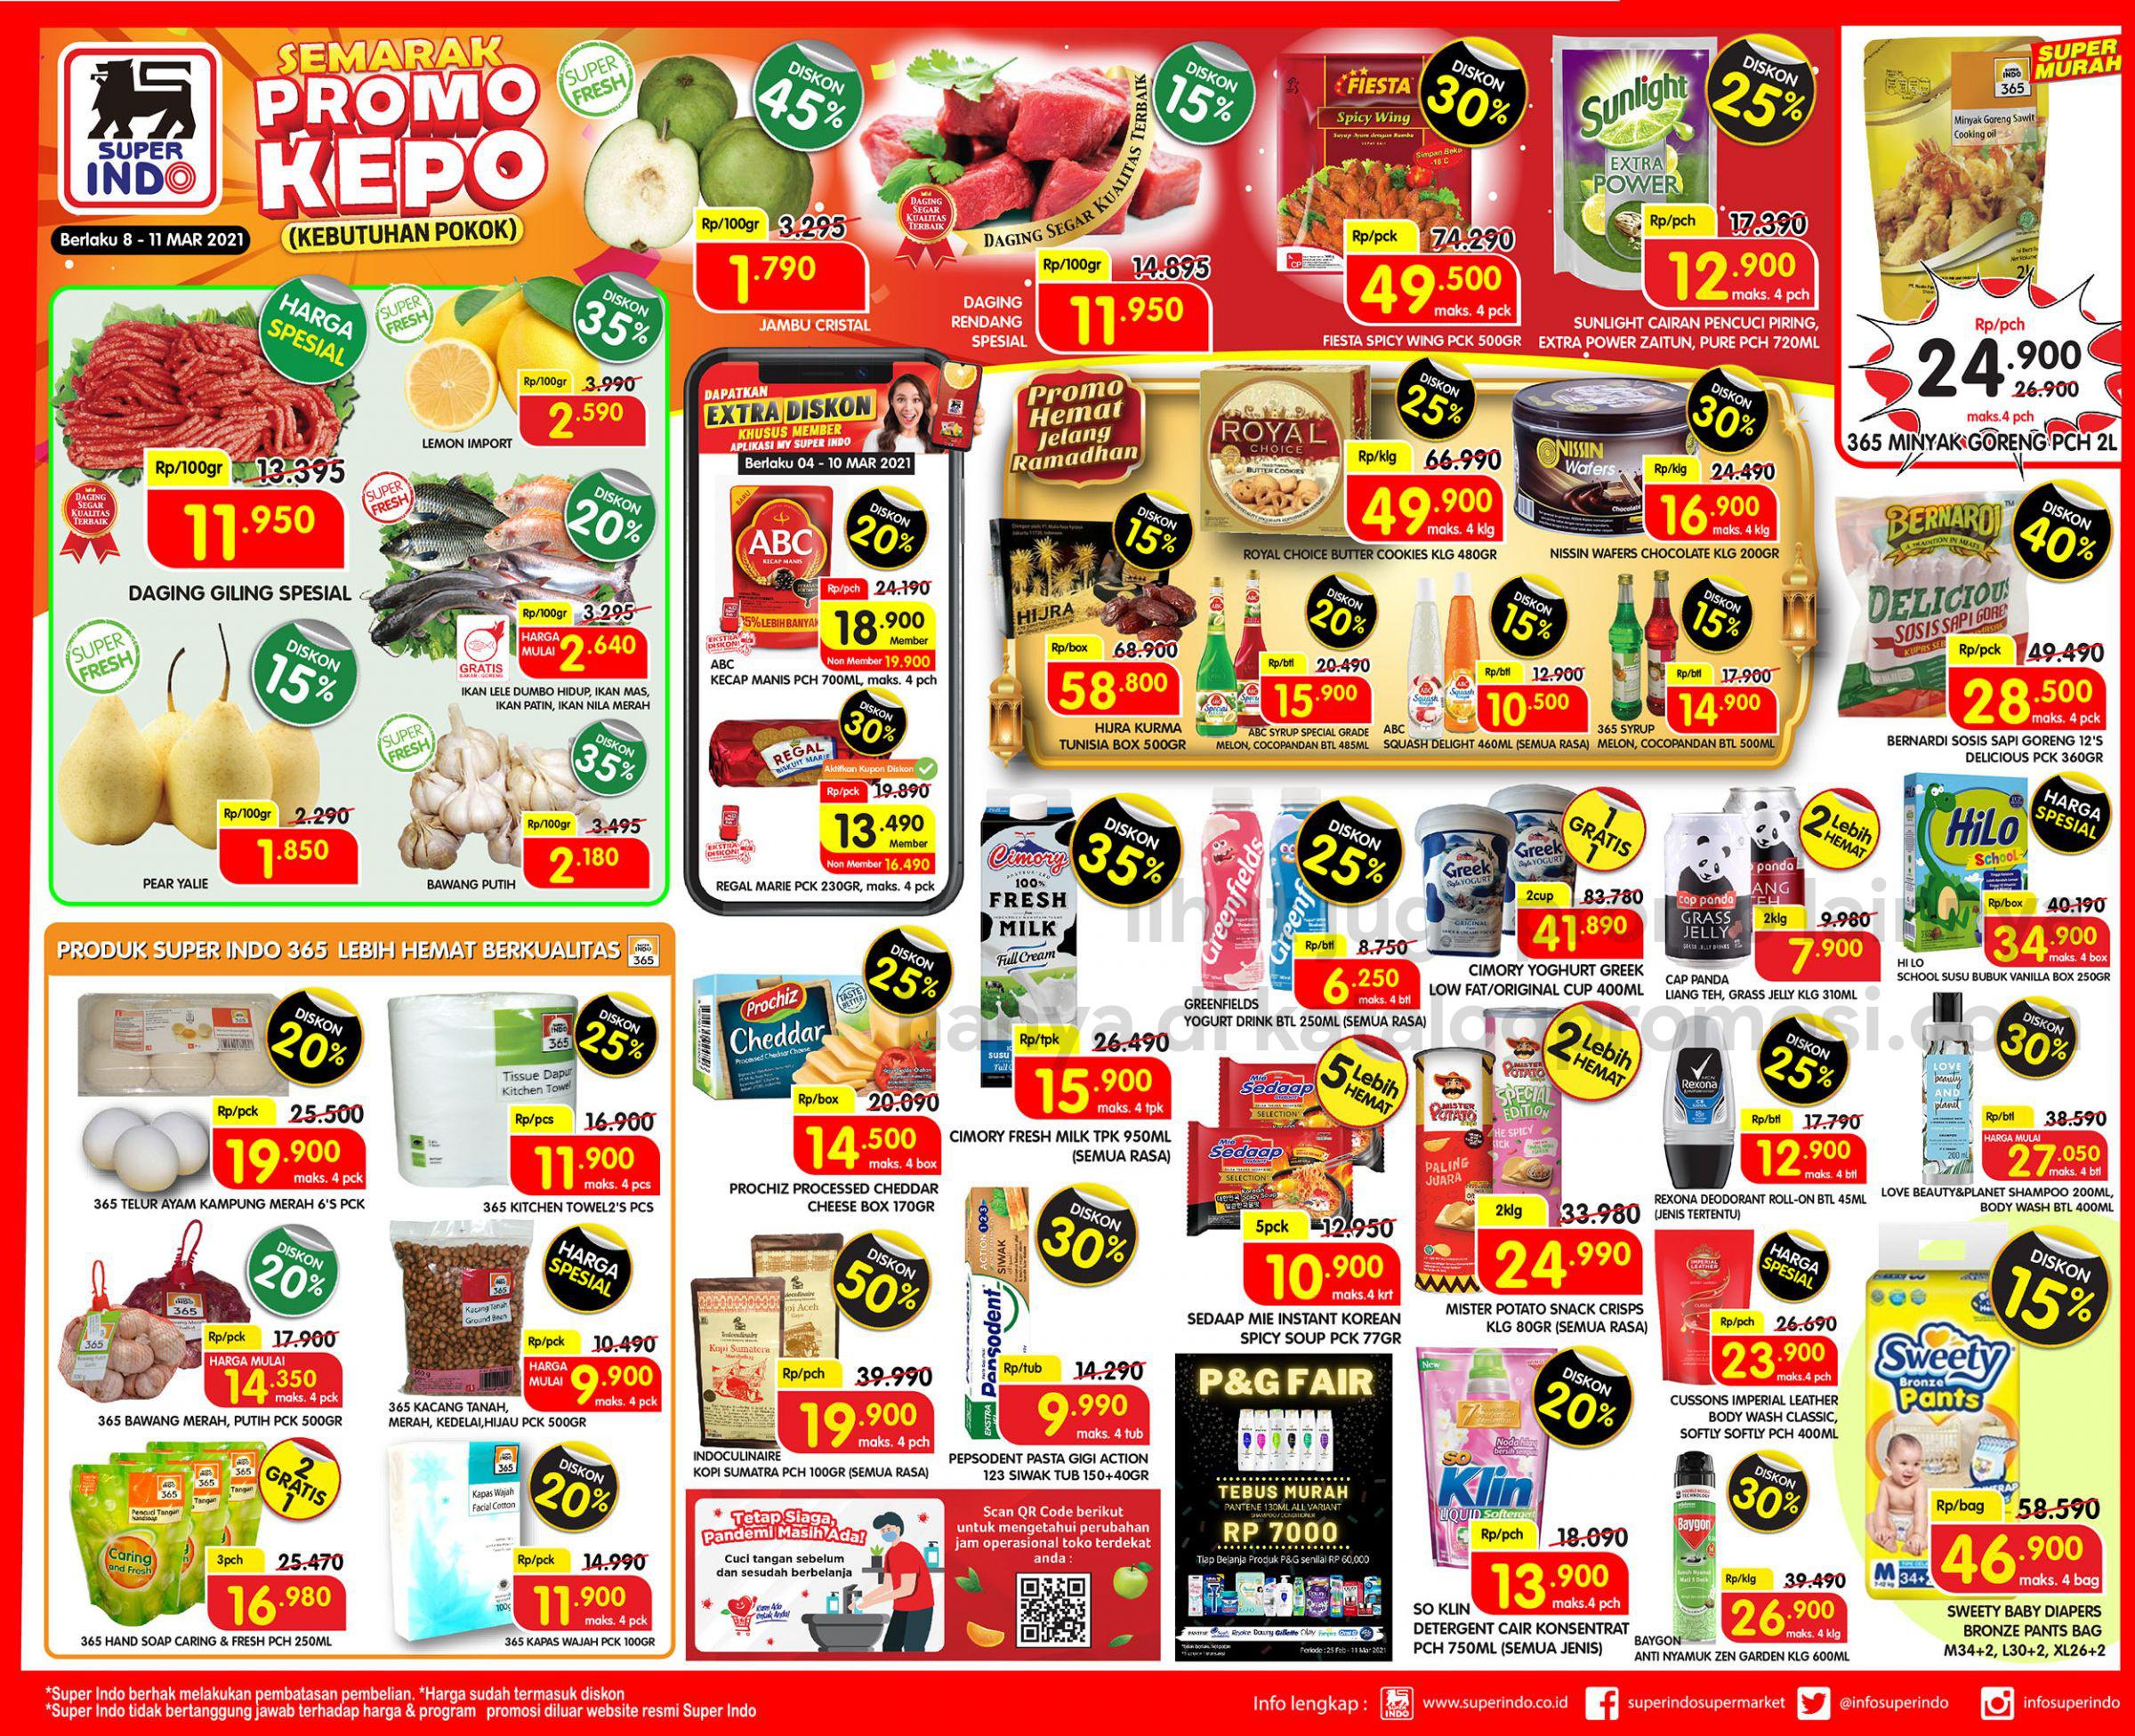 Promo Superindo Katalog Awal Pekan (Weekday) periode 08-11 Maret 2021